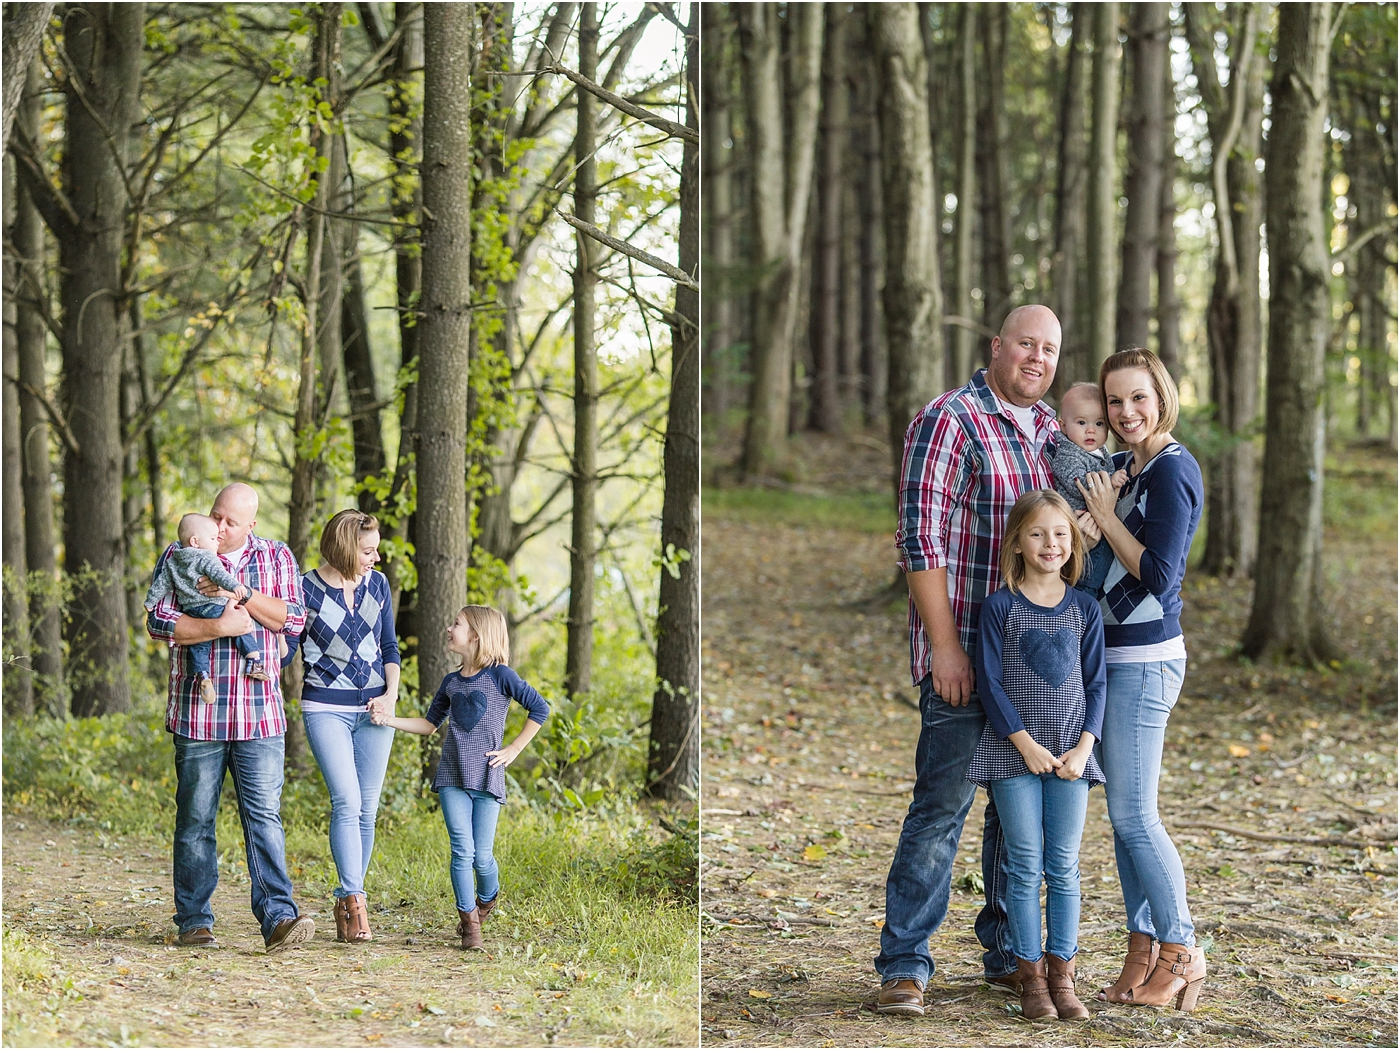 Huter-Family-2016-42.jpg